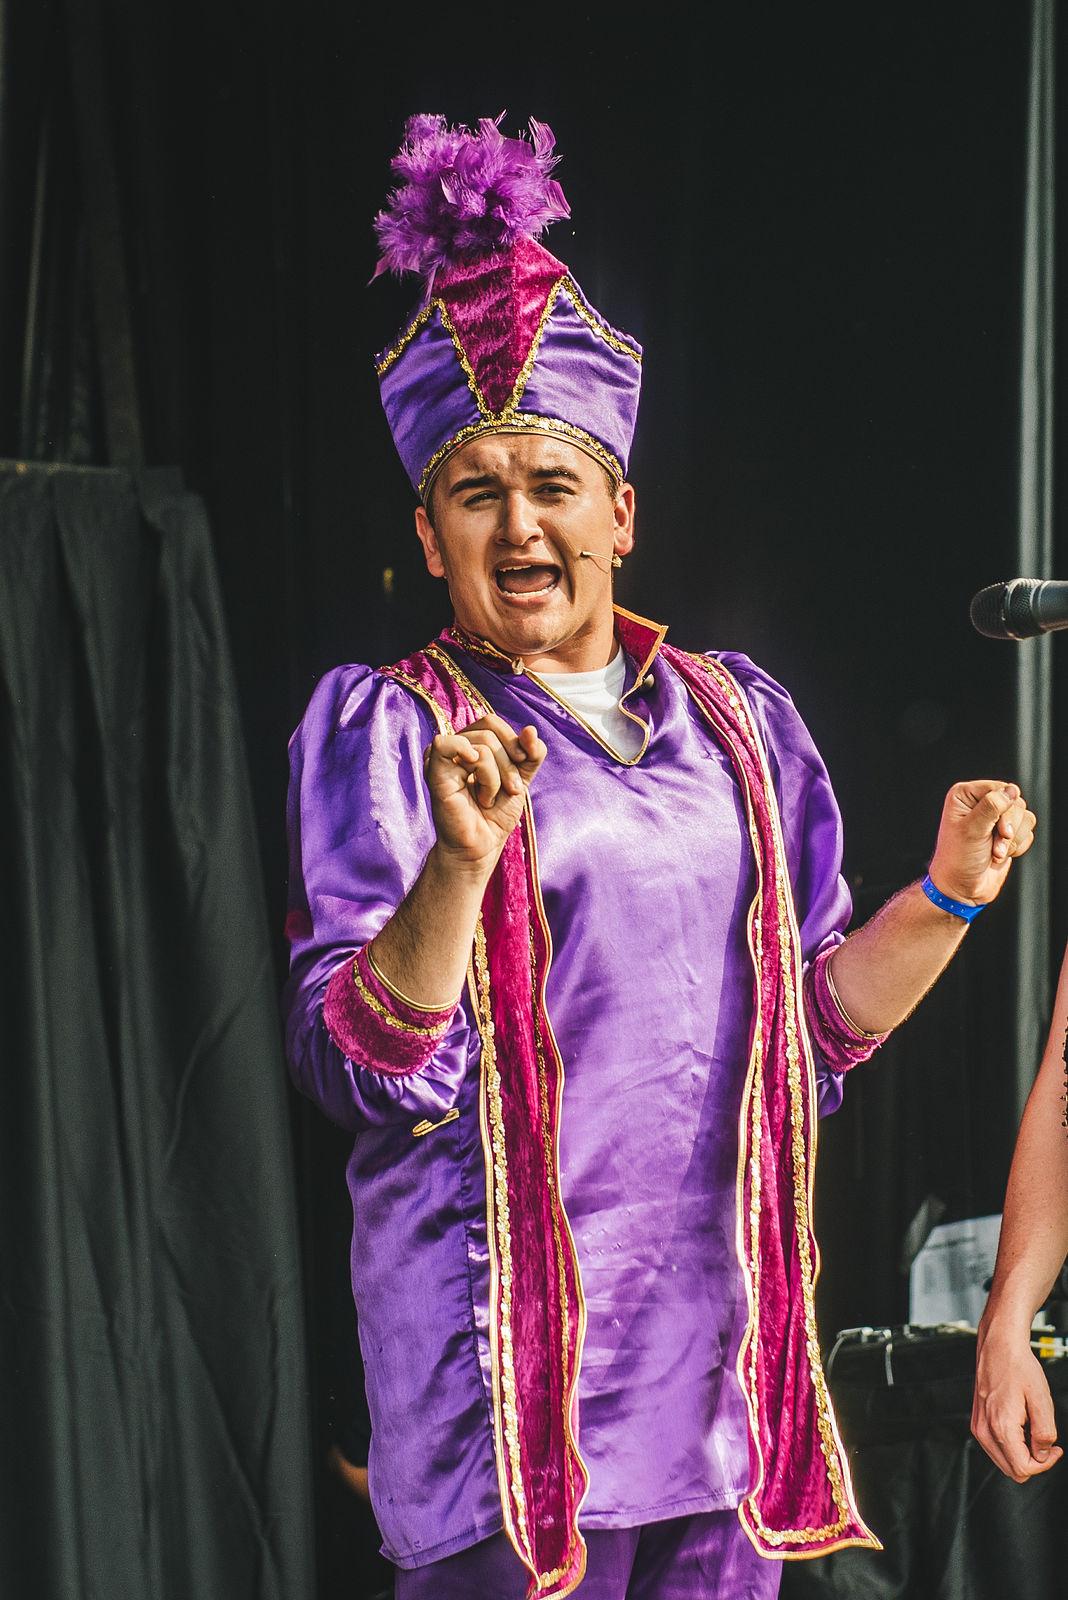 Geronimo Festival Knebworth 2018